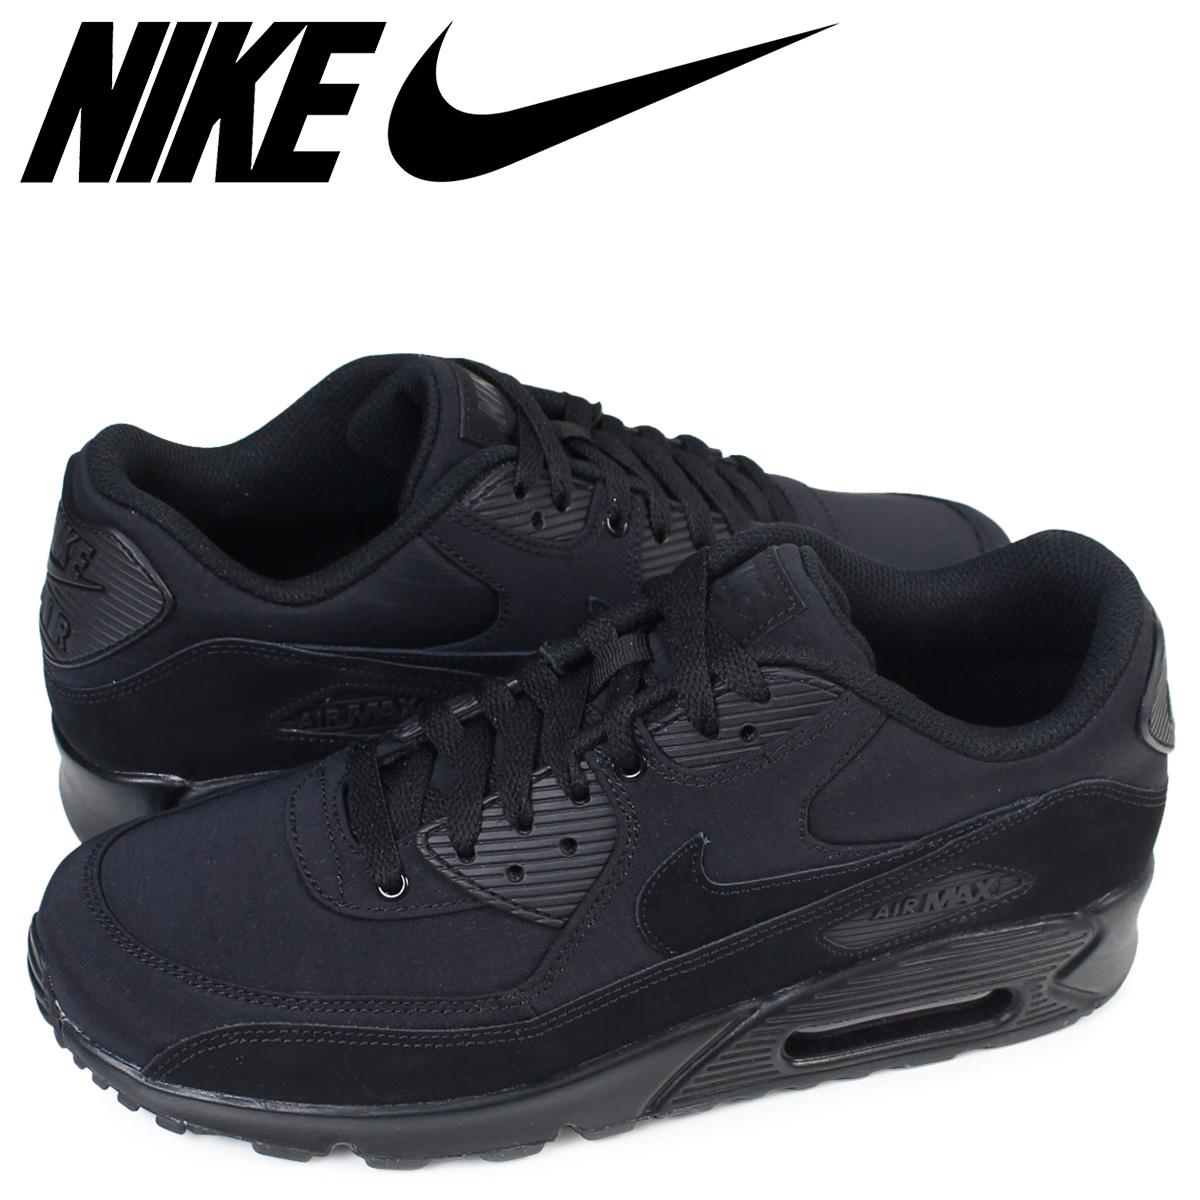 ALLSPORTS: NIKE AIR MAX 90 EZ Kie Ney AMAX 90 sneakers men